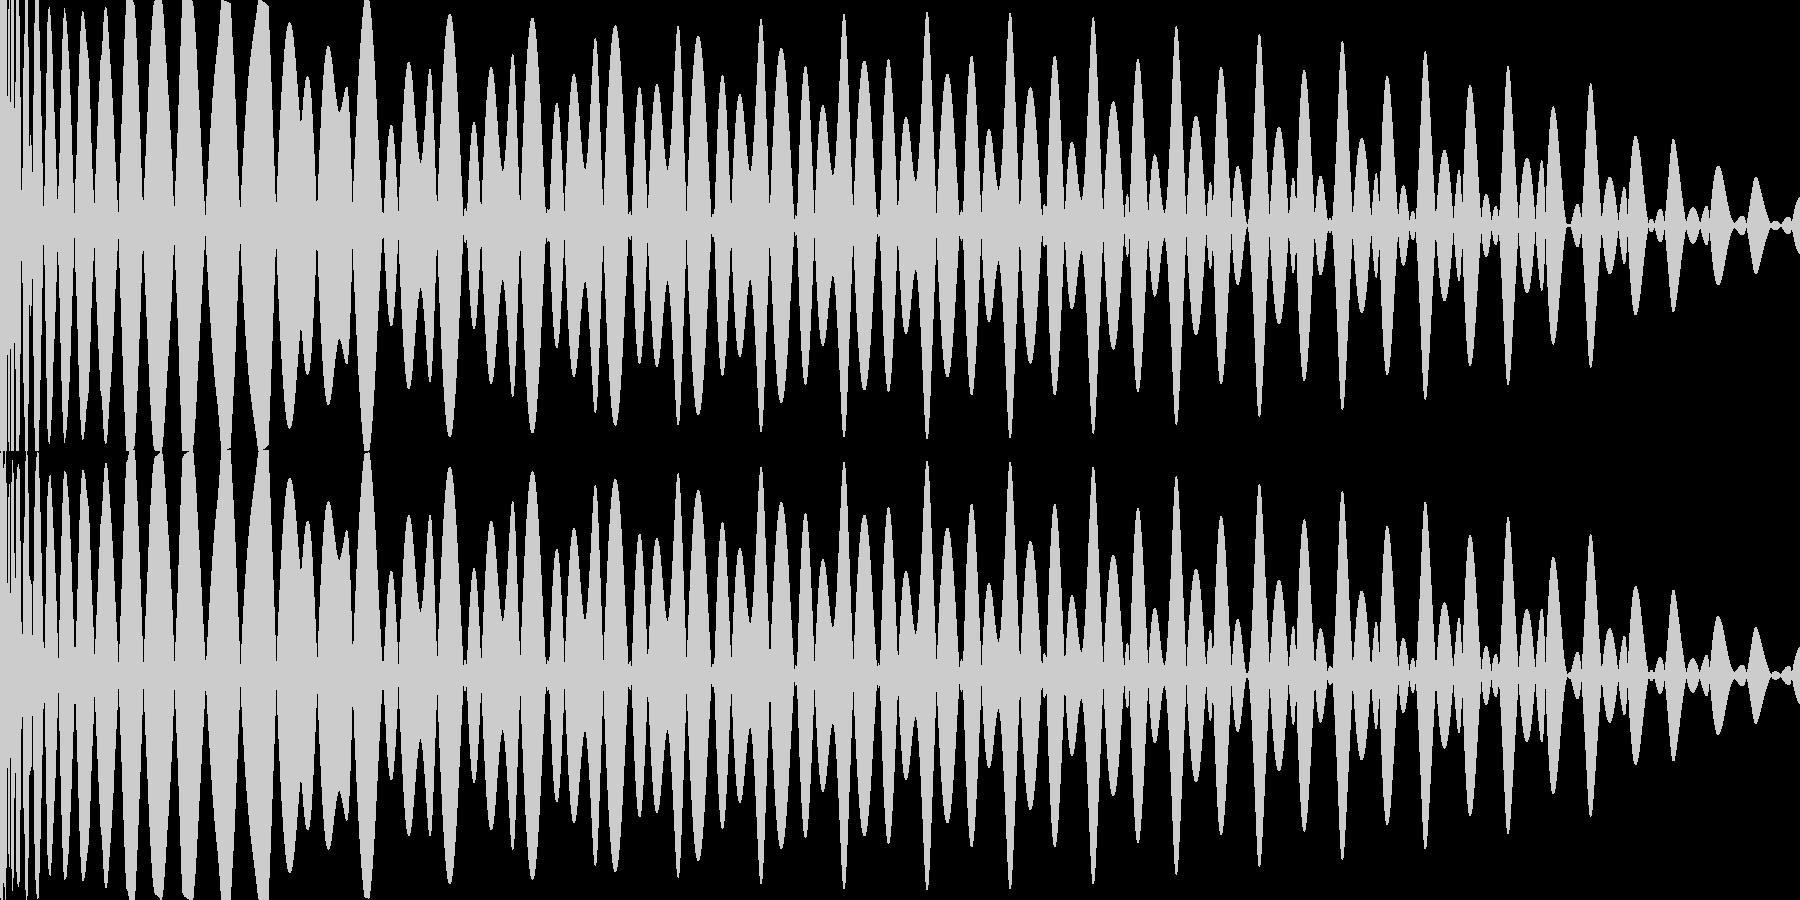 EDM キー(G)入りキックの未再生の波形